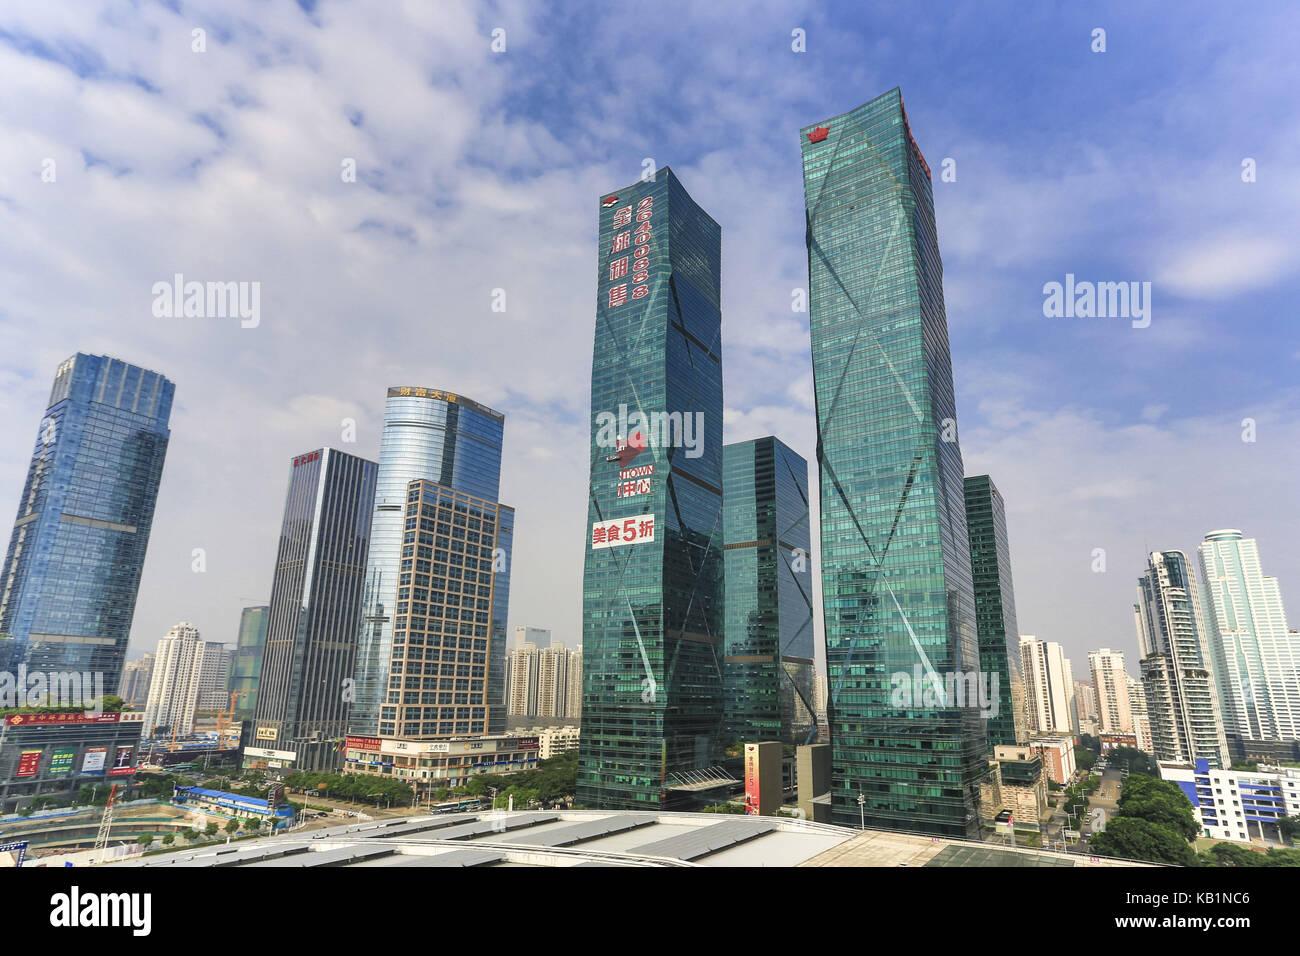 Skyscraper, Futian Becoming, Shenzhen, - Stock Image